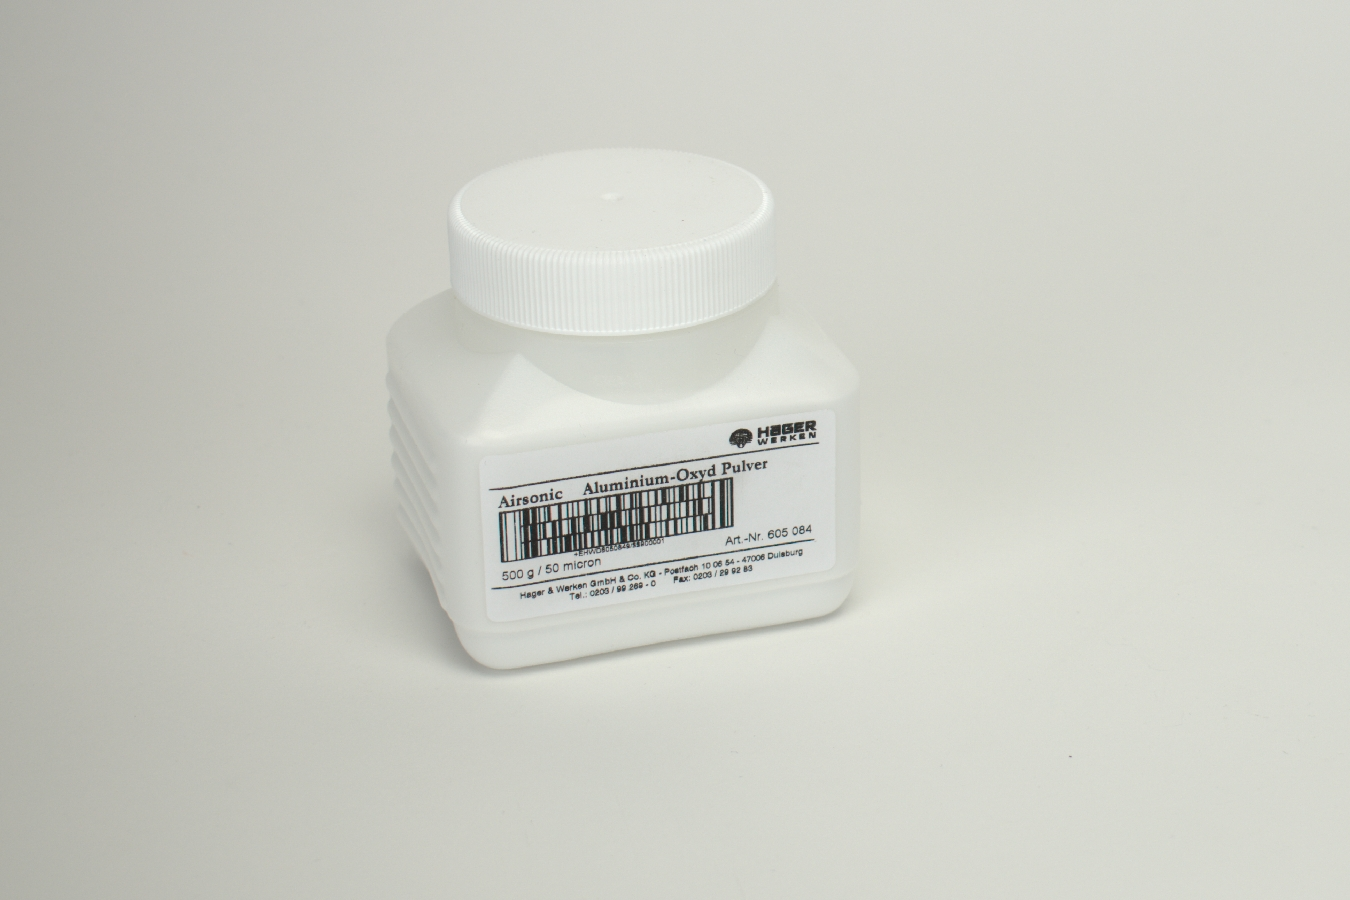 Airsonic Alu-Oxyd 50my 500g